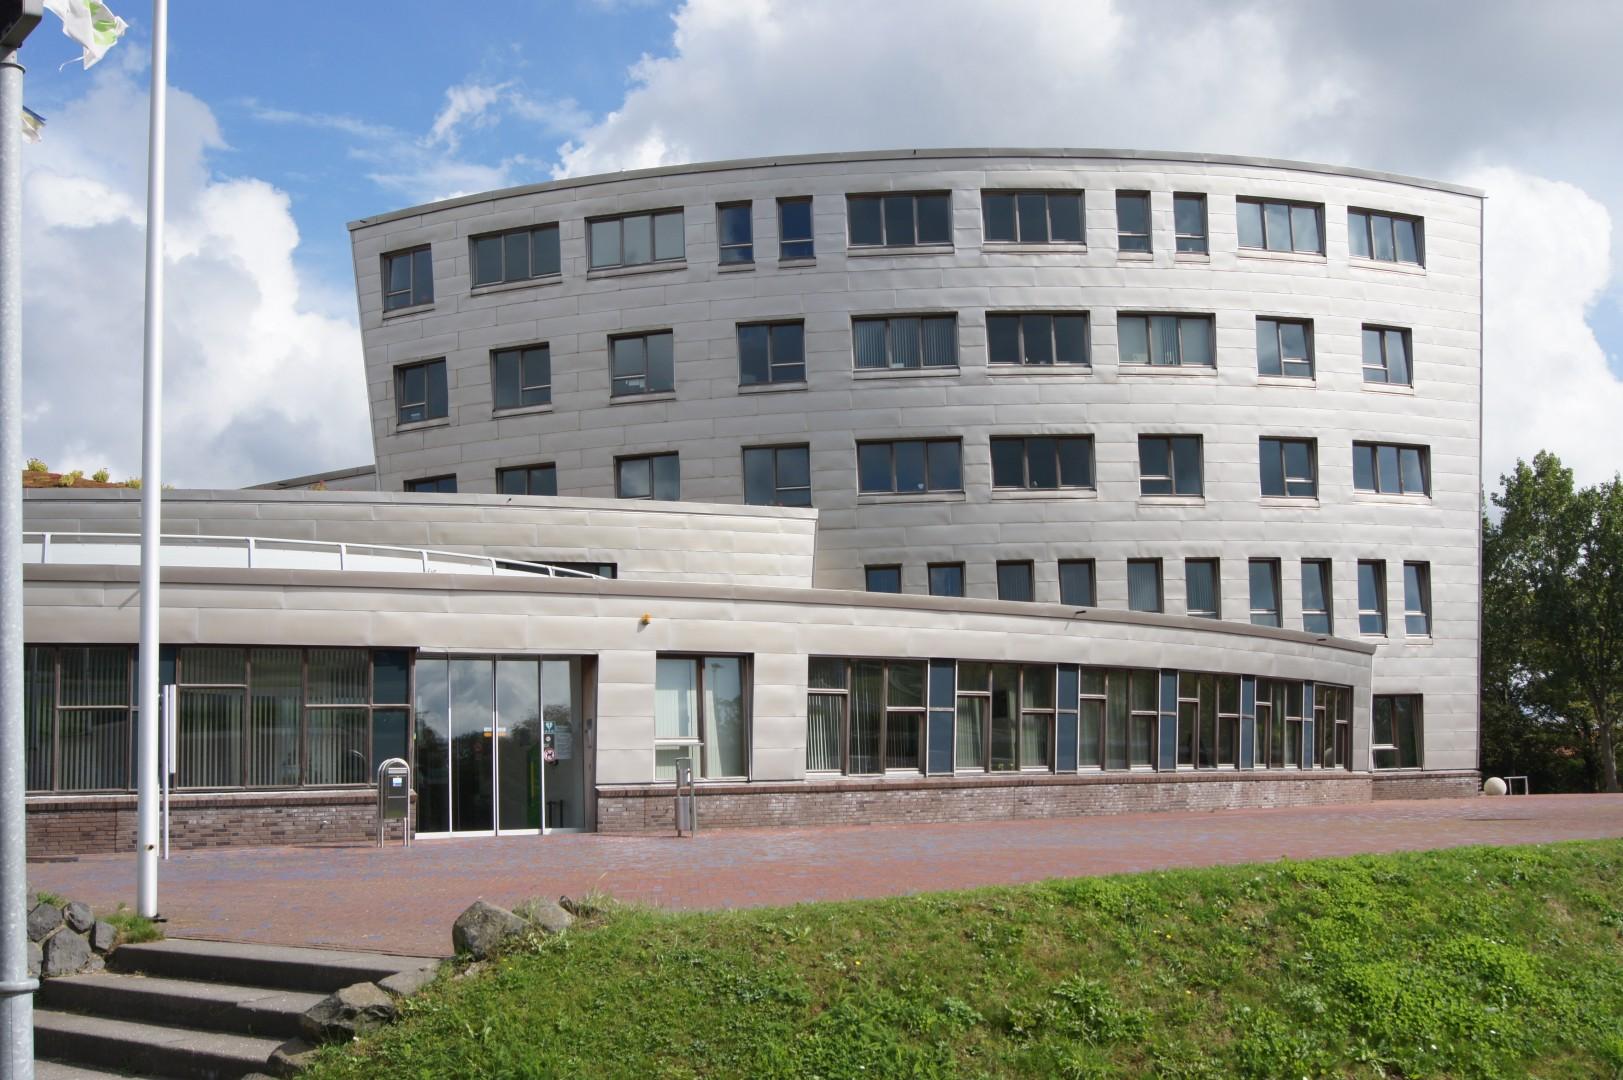 Adviesraad Sociaal Domein Schouwen-Duiveland - Adviesraad Sociaal Domein Gemeente Schouwen-Duiveland